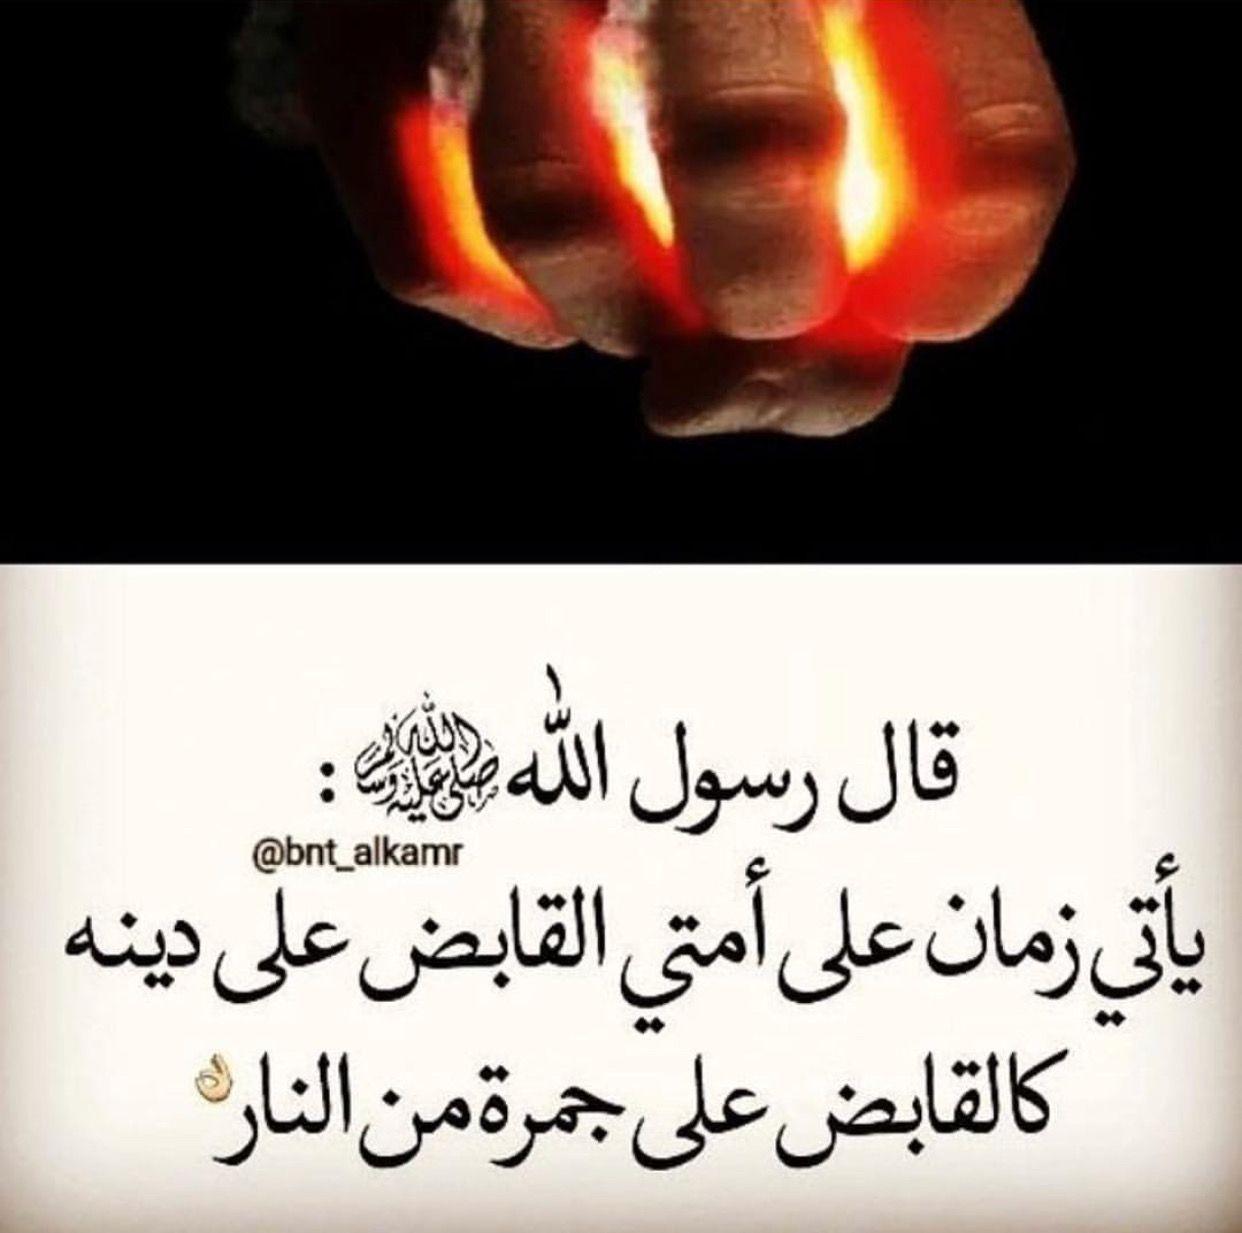 Pin By Nada On سيدنا محمد صلي الله علي وسلم Arabic Calligraphy Calligraphy